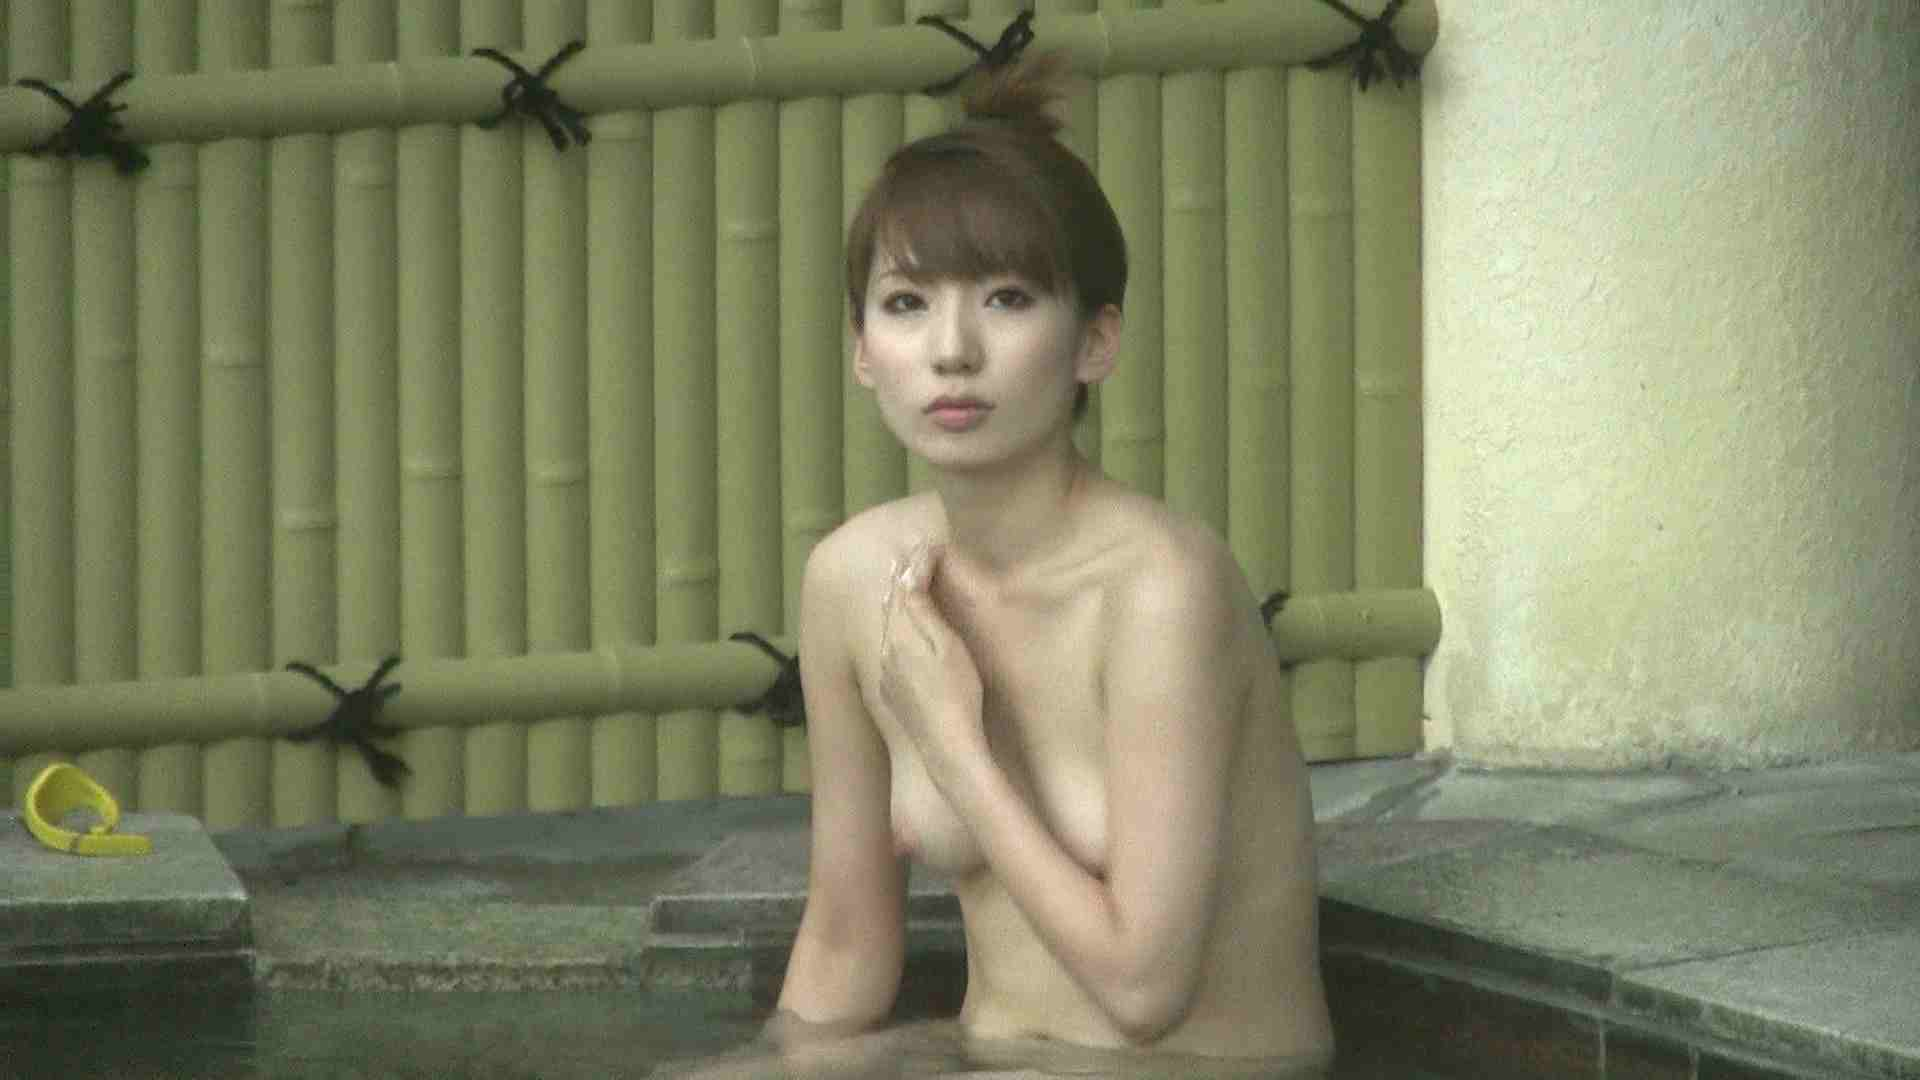 Aquaな露天風呂Vol.208 盗撮 隠し撮りオマンコ動画紹介 85画像 38